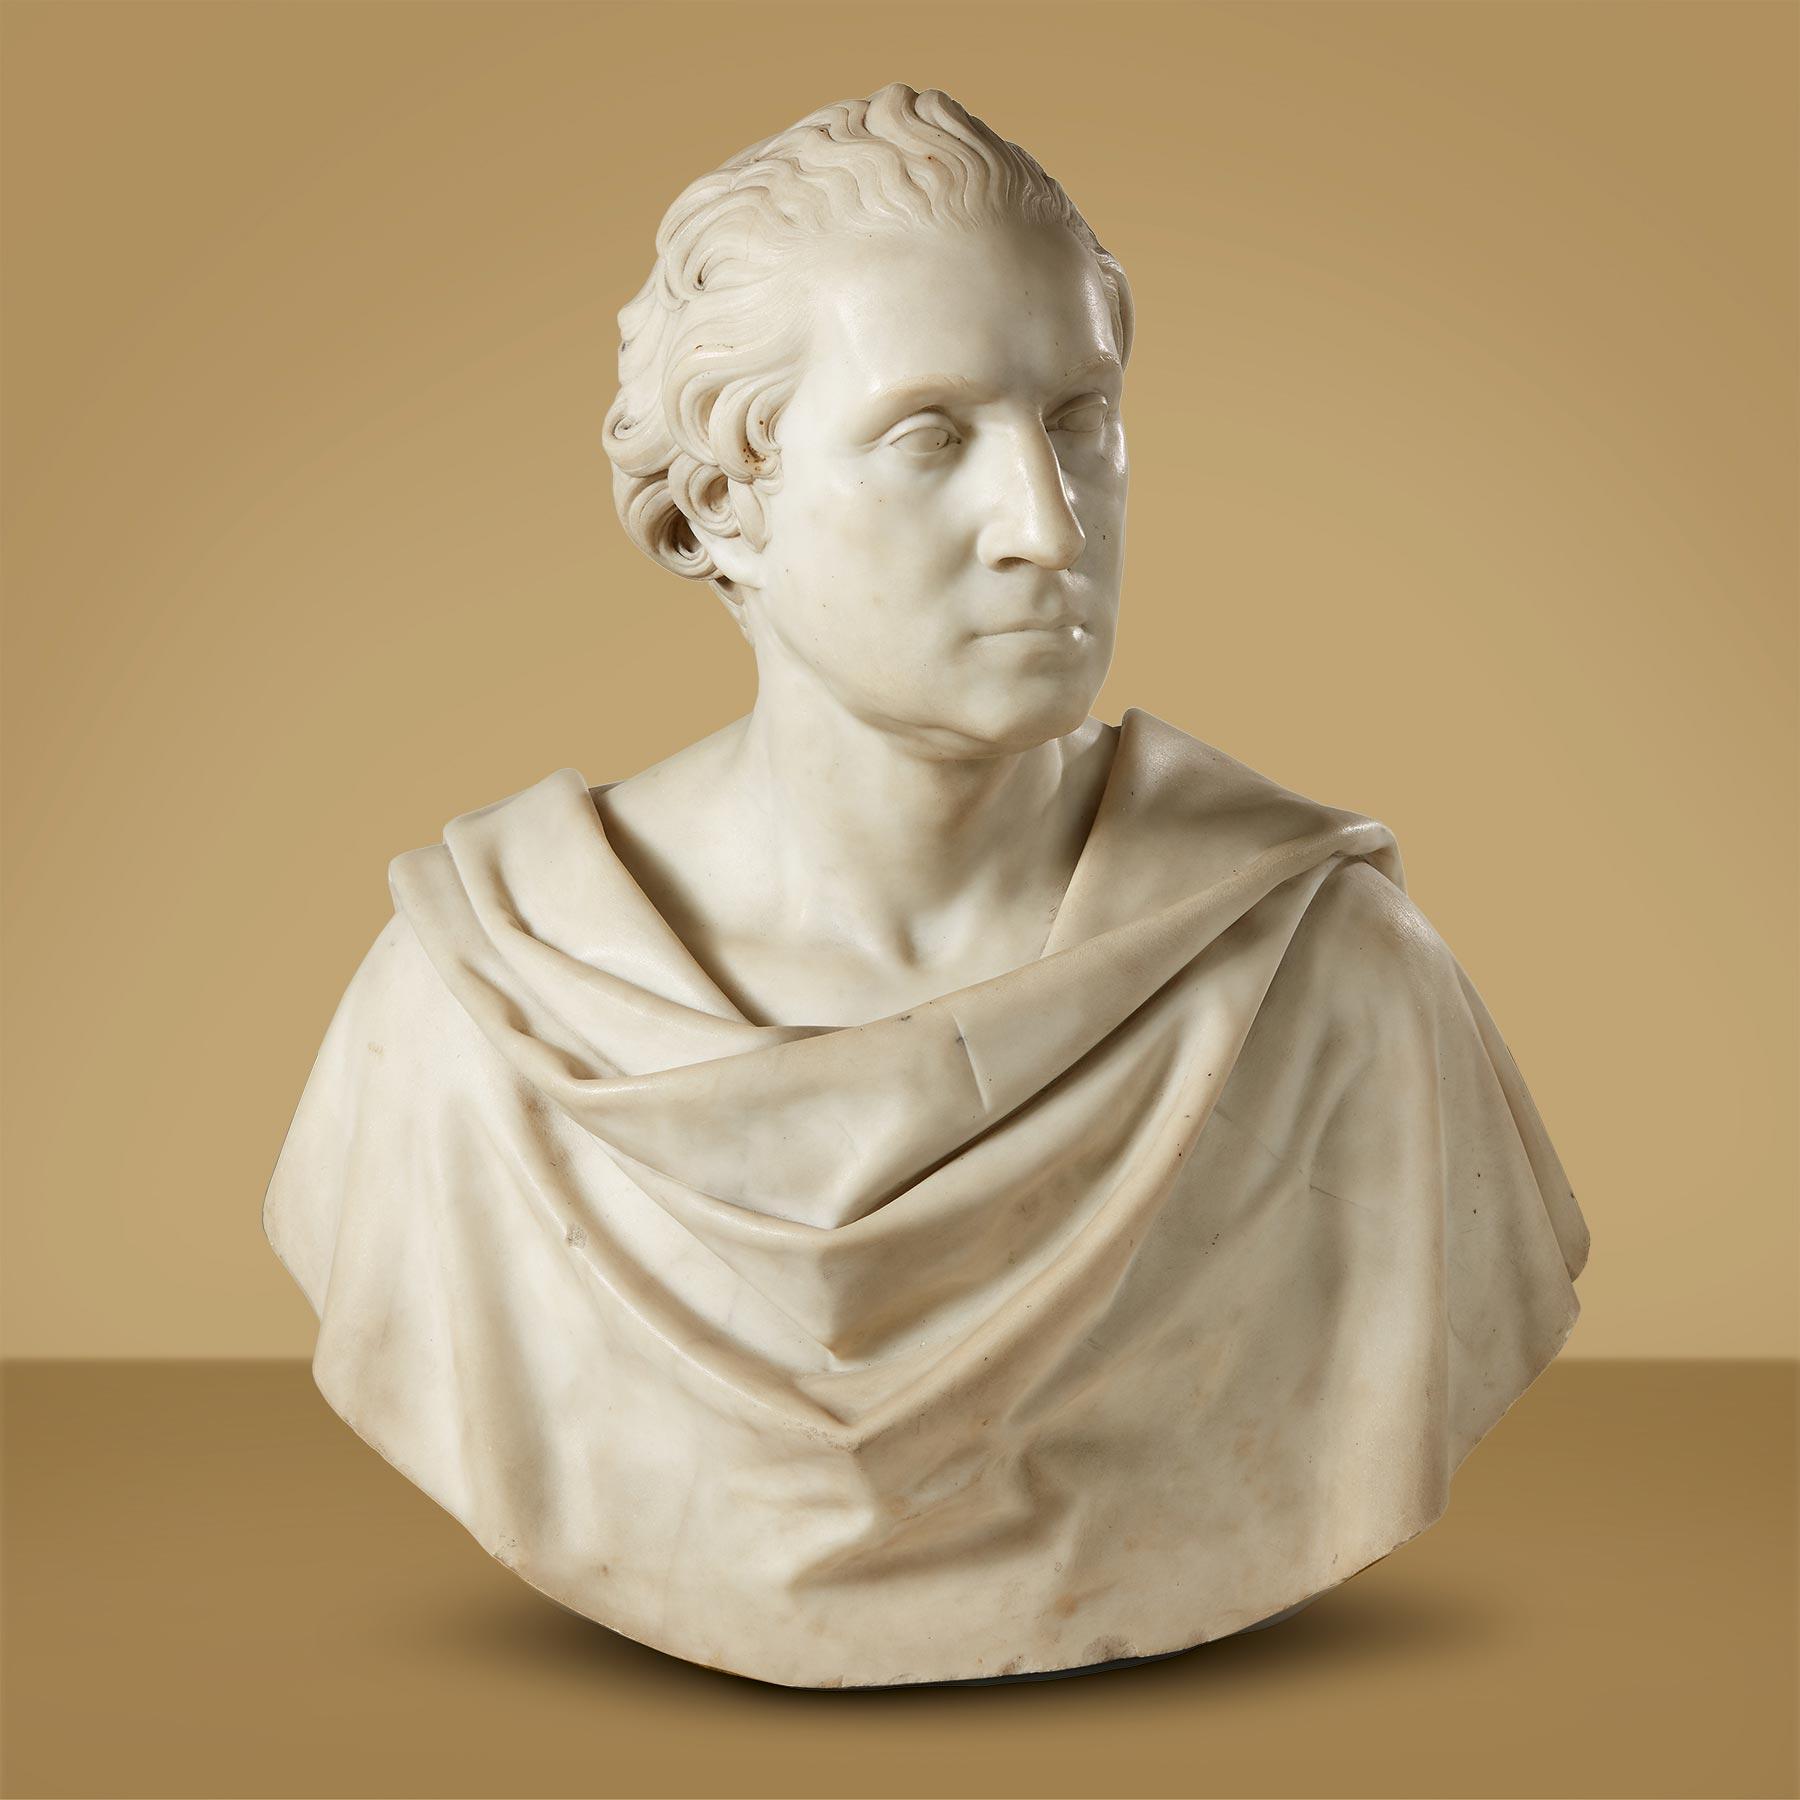 A bust of George Washington